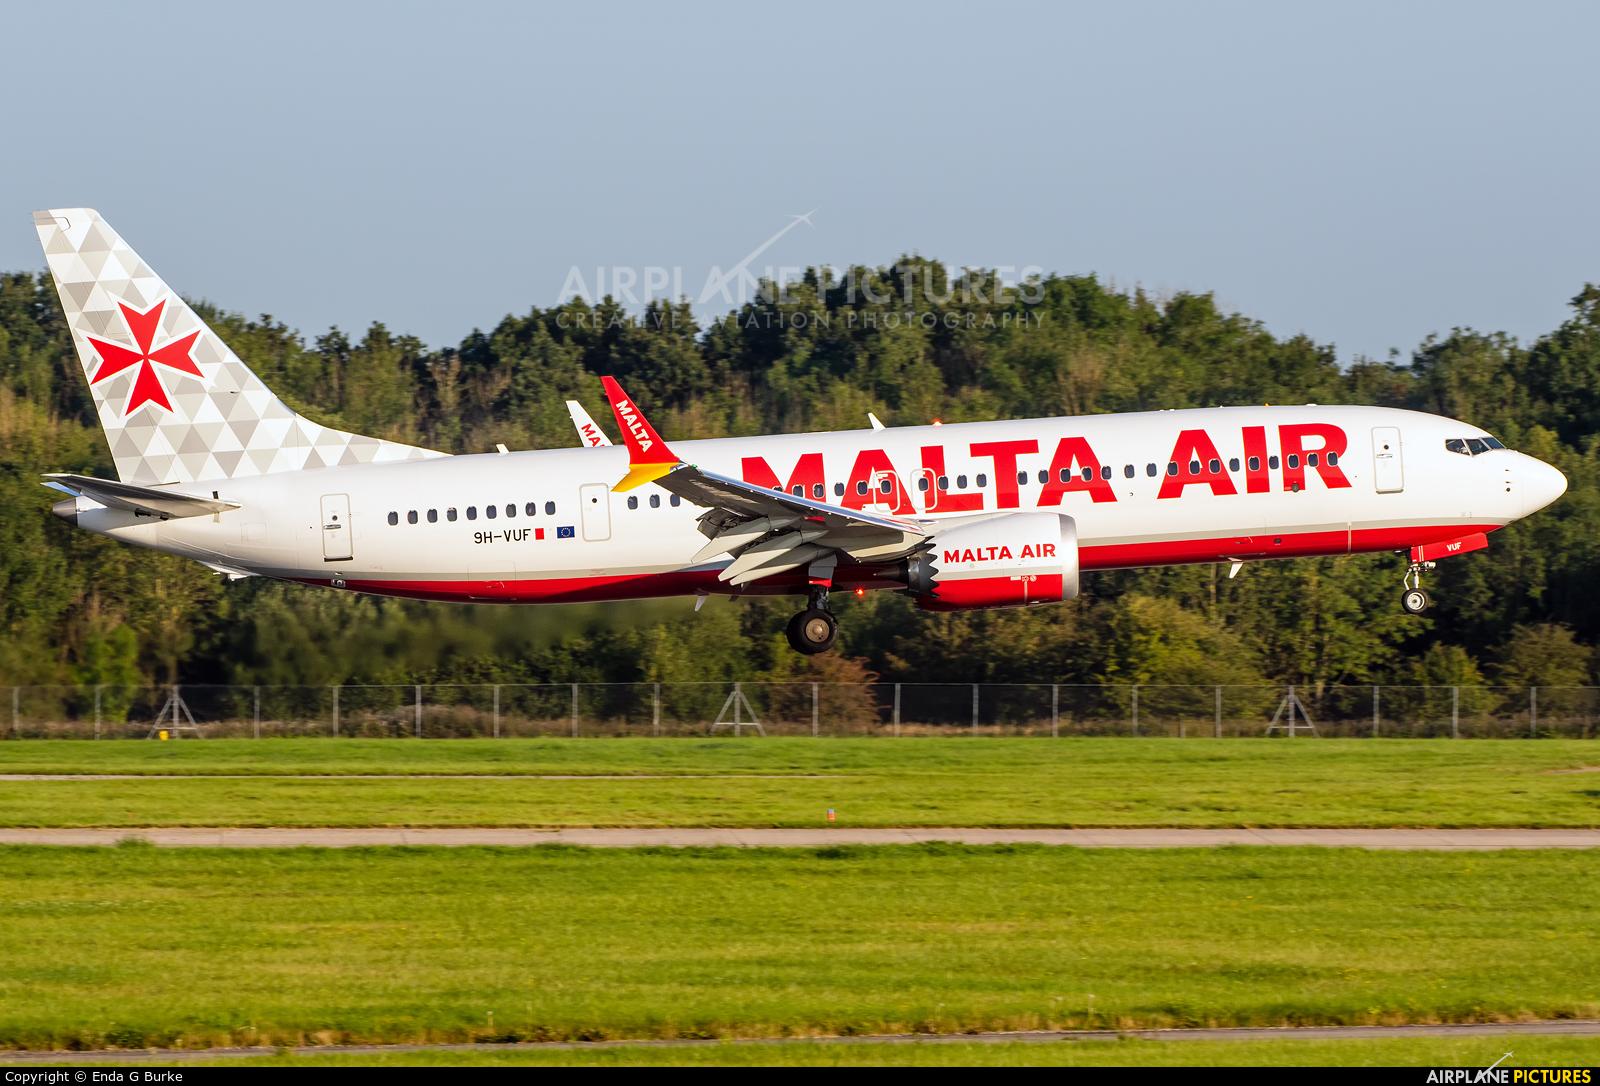 Malta Air 9H-VUF aircraft at Manchester